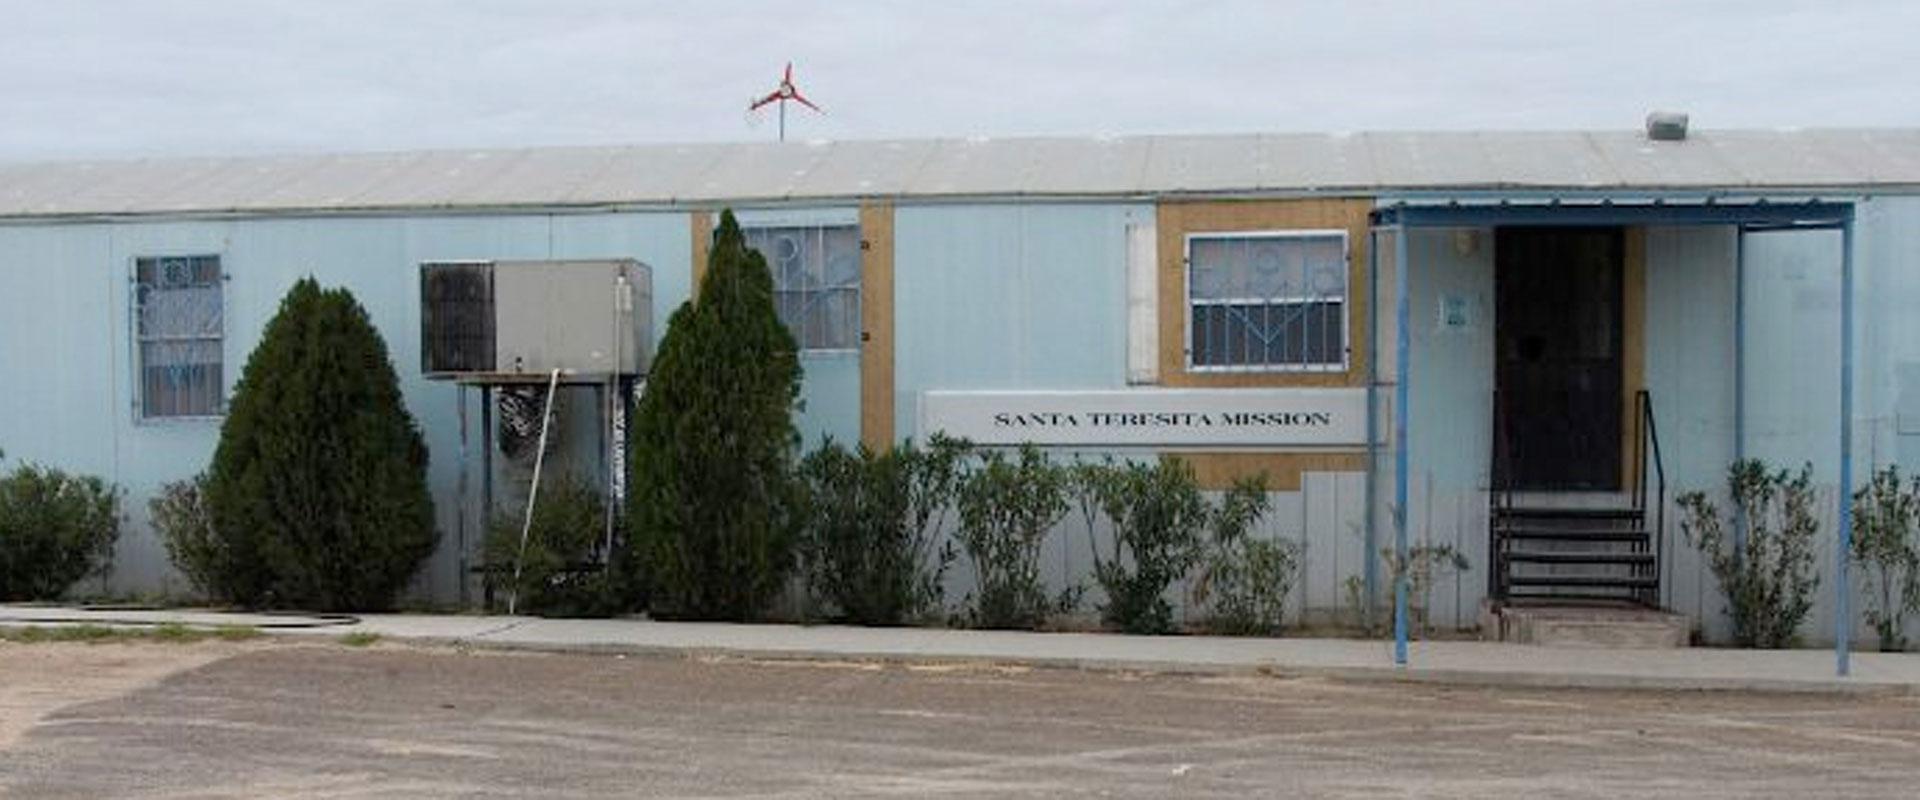 Santa Teresita Mission